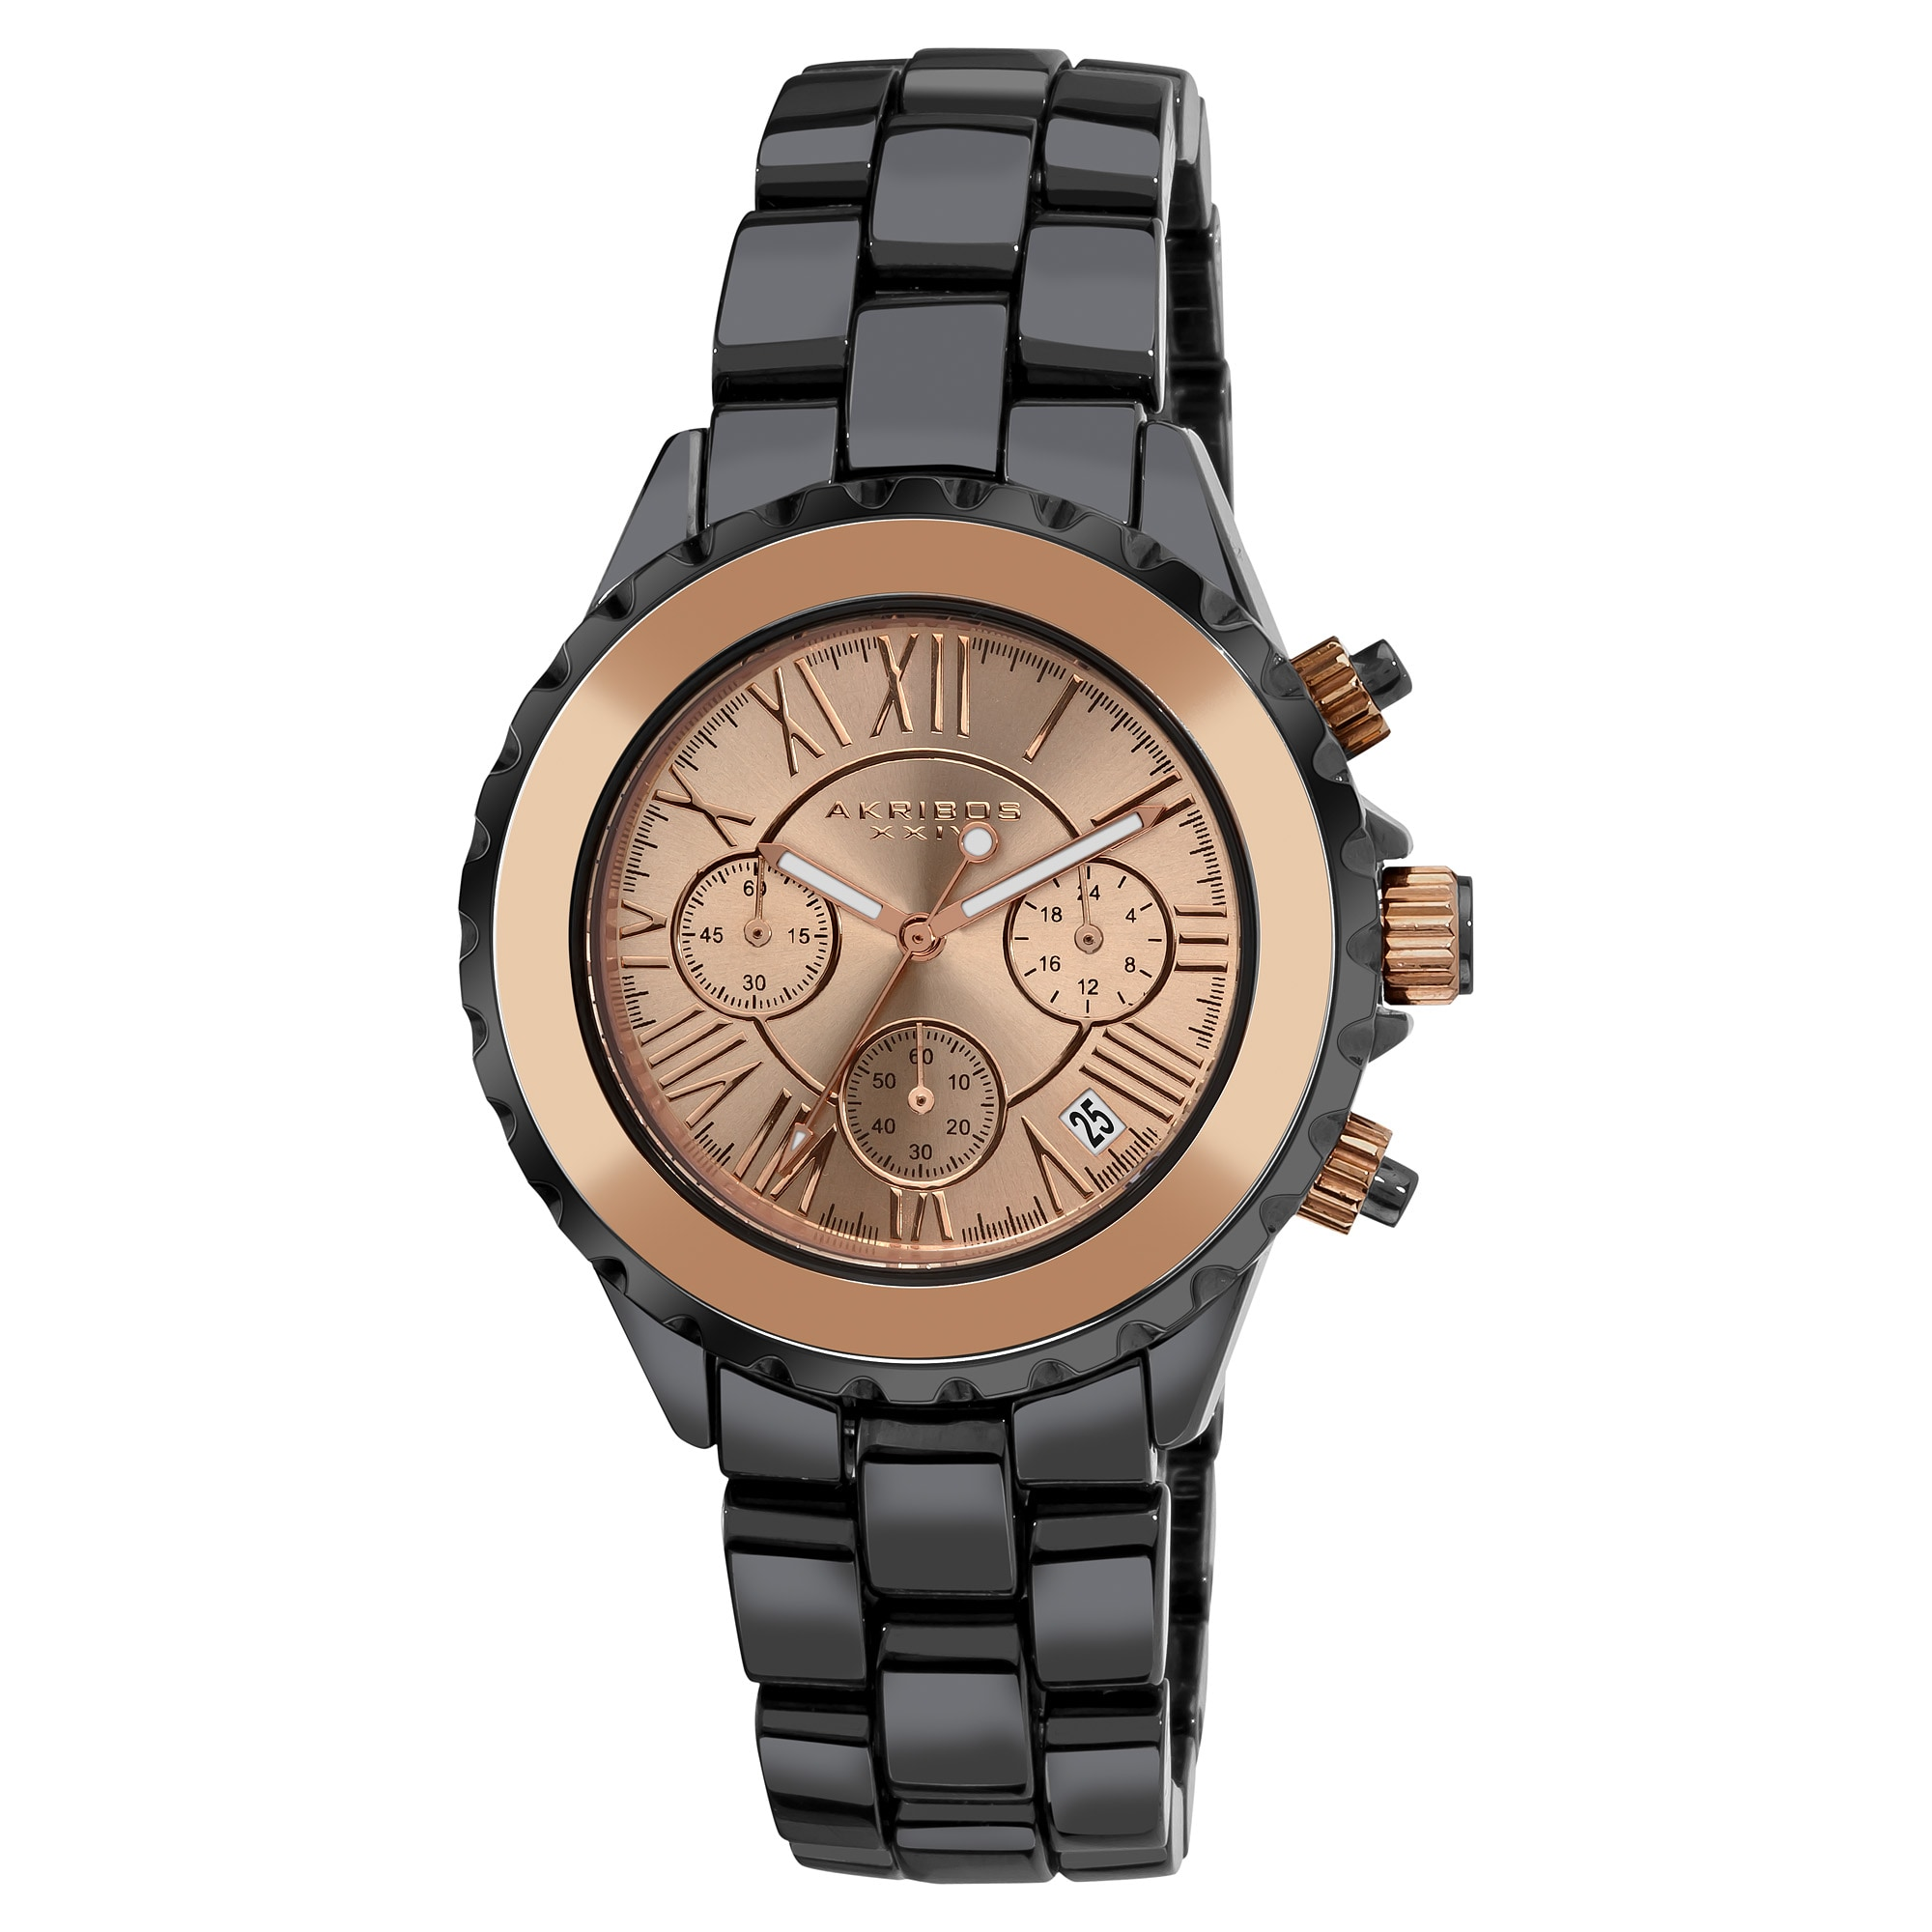 Akribos XXIV Men's Ceramic Rose-tone Chronograph Watch